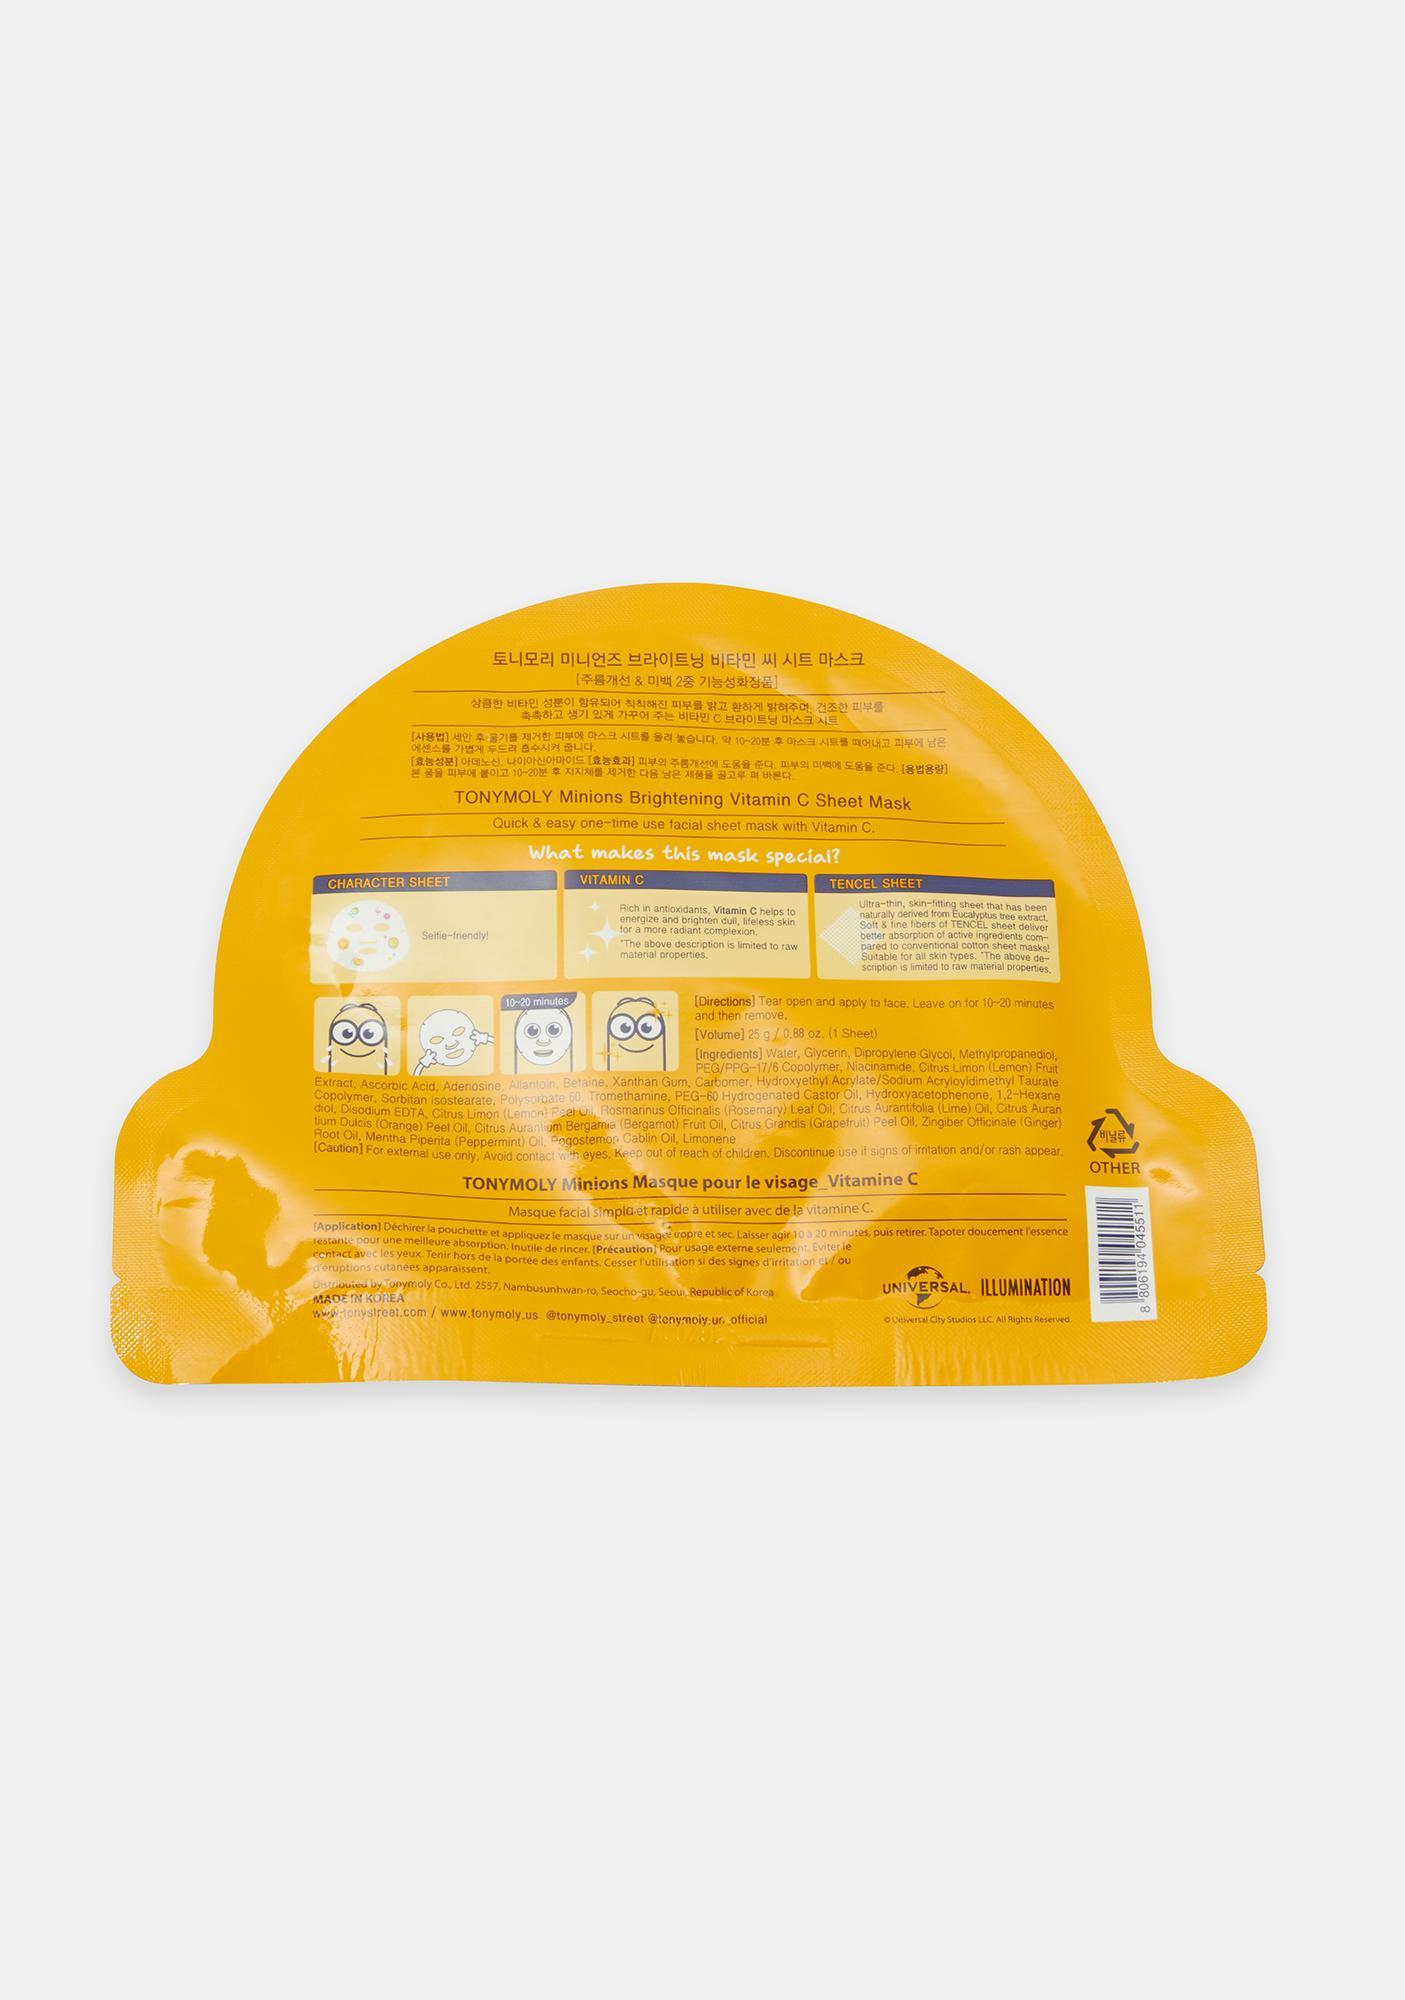 TONYMOLY Minions Brightening Vitamin C Sheet Mask